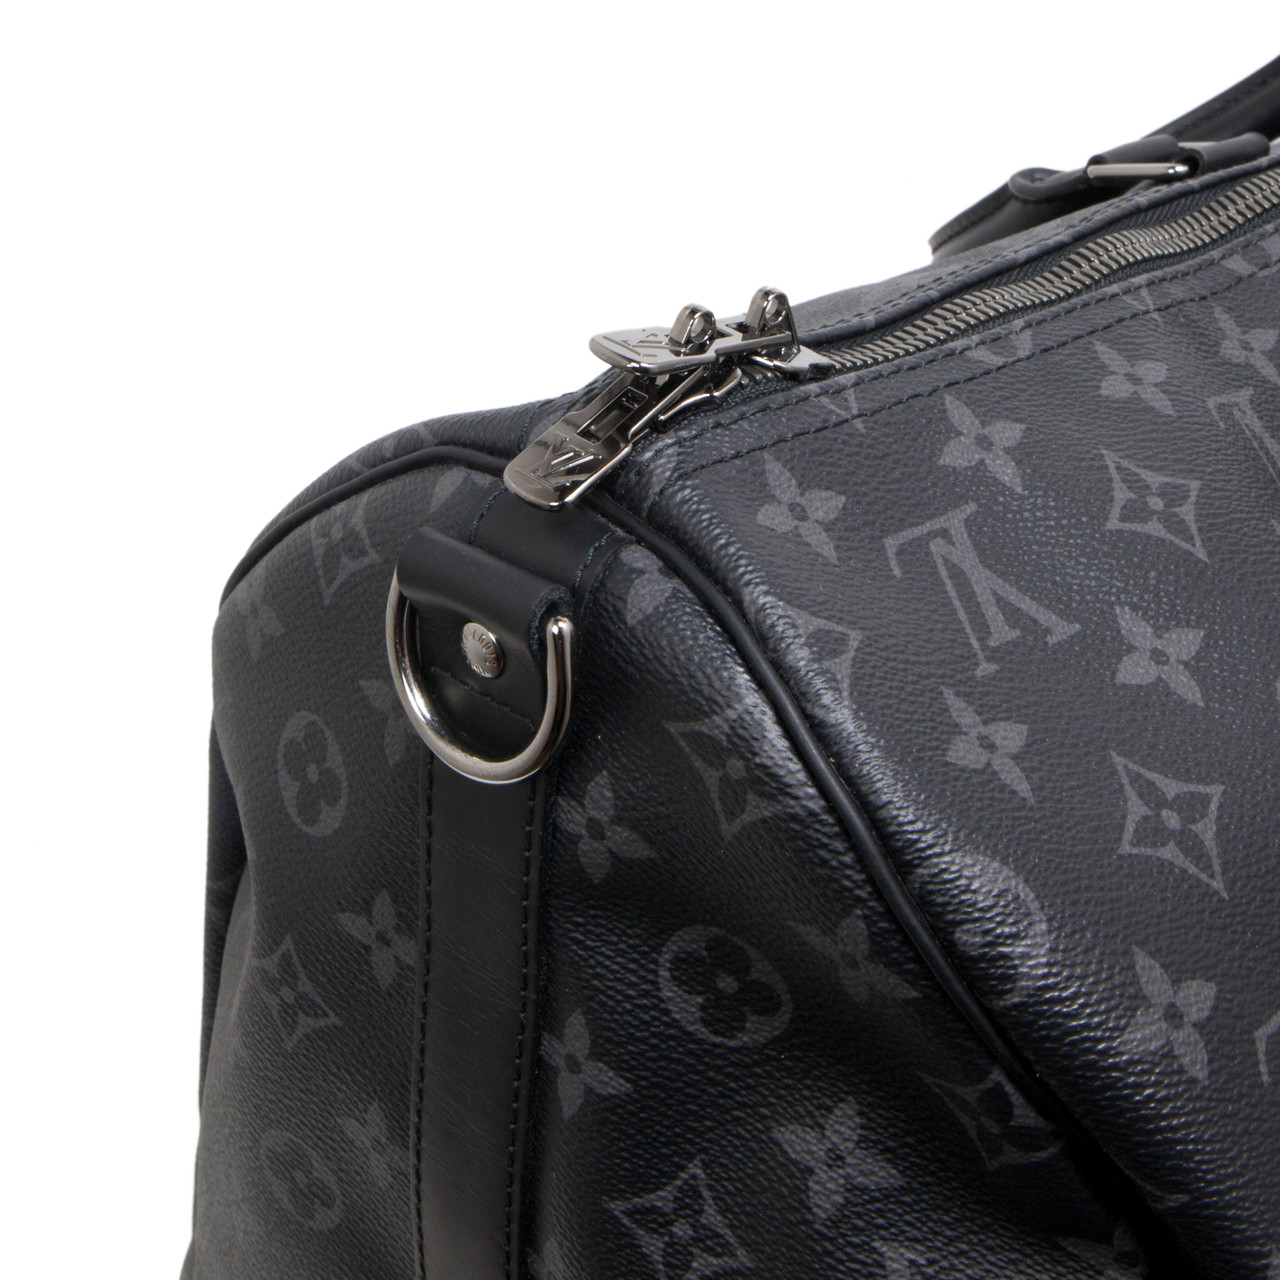 b5da5057dc04 Louis Vuitton Monogram Eclipse Keepall Bandouliere 55 - modaselle